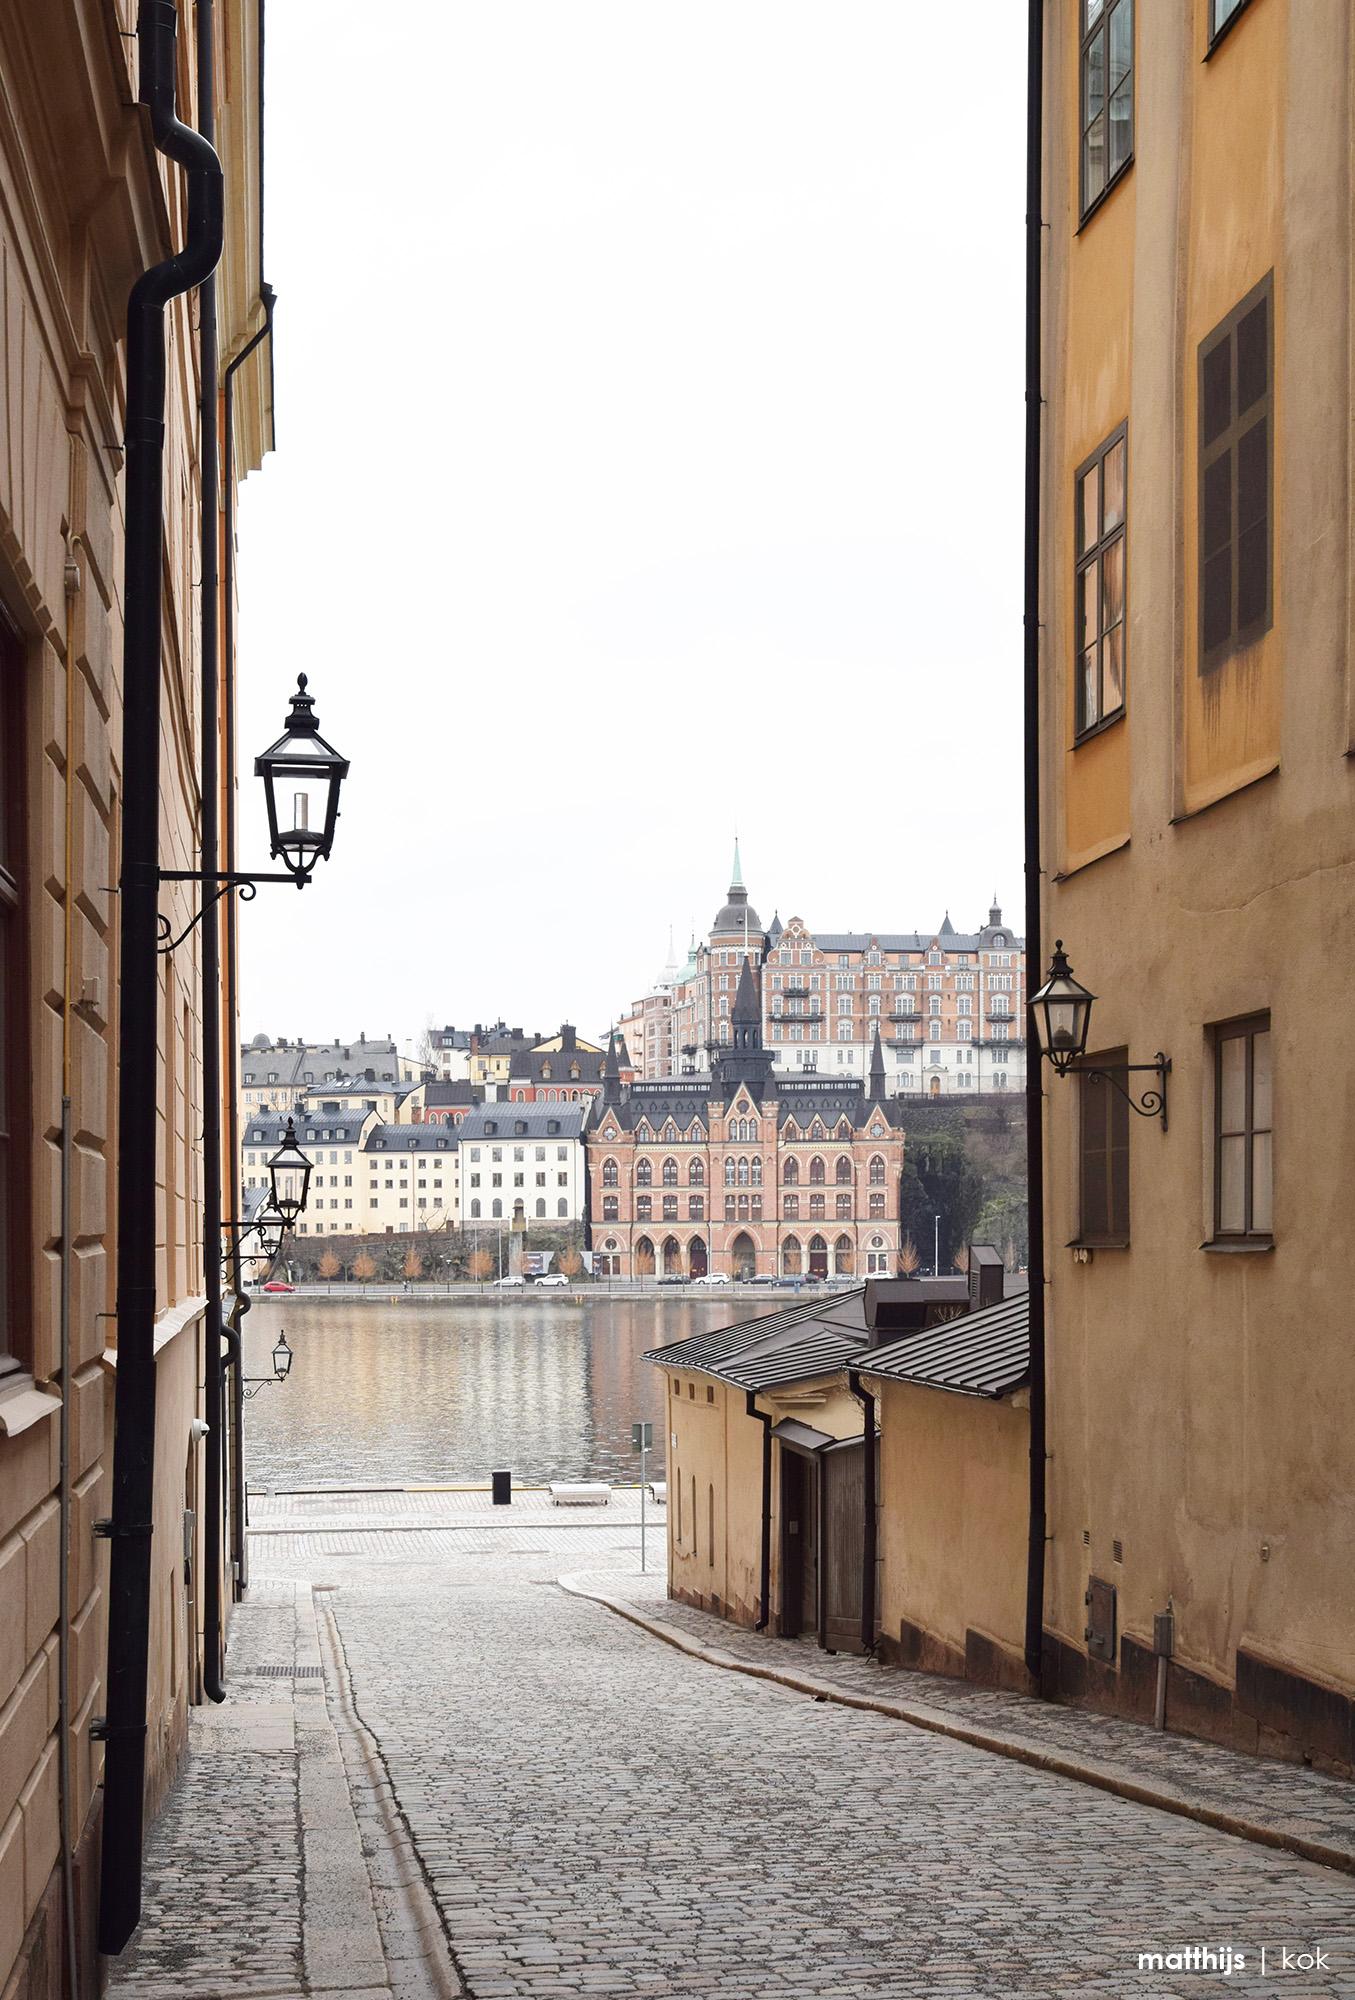 Riddarholmen, Stockholm, Sweden | Photo by Matthijs Kok